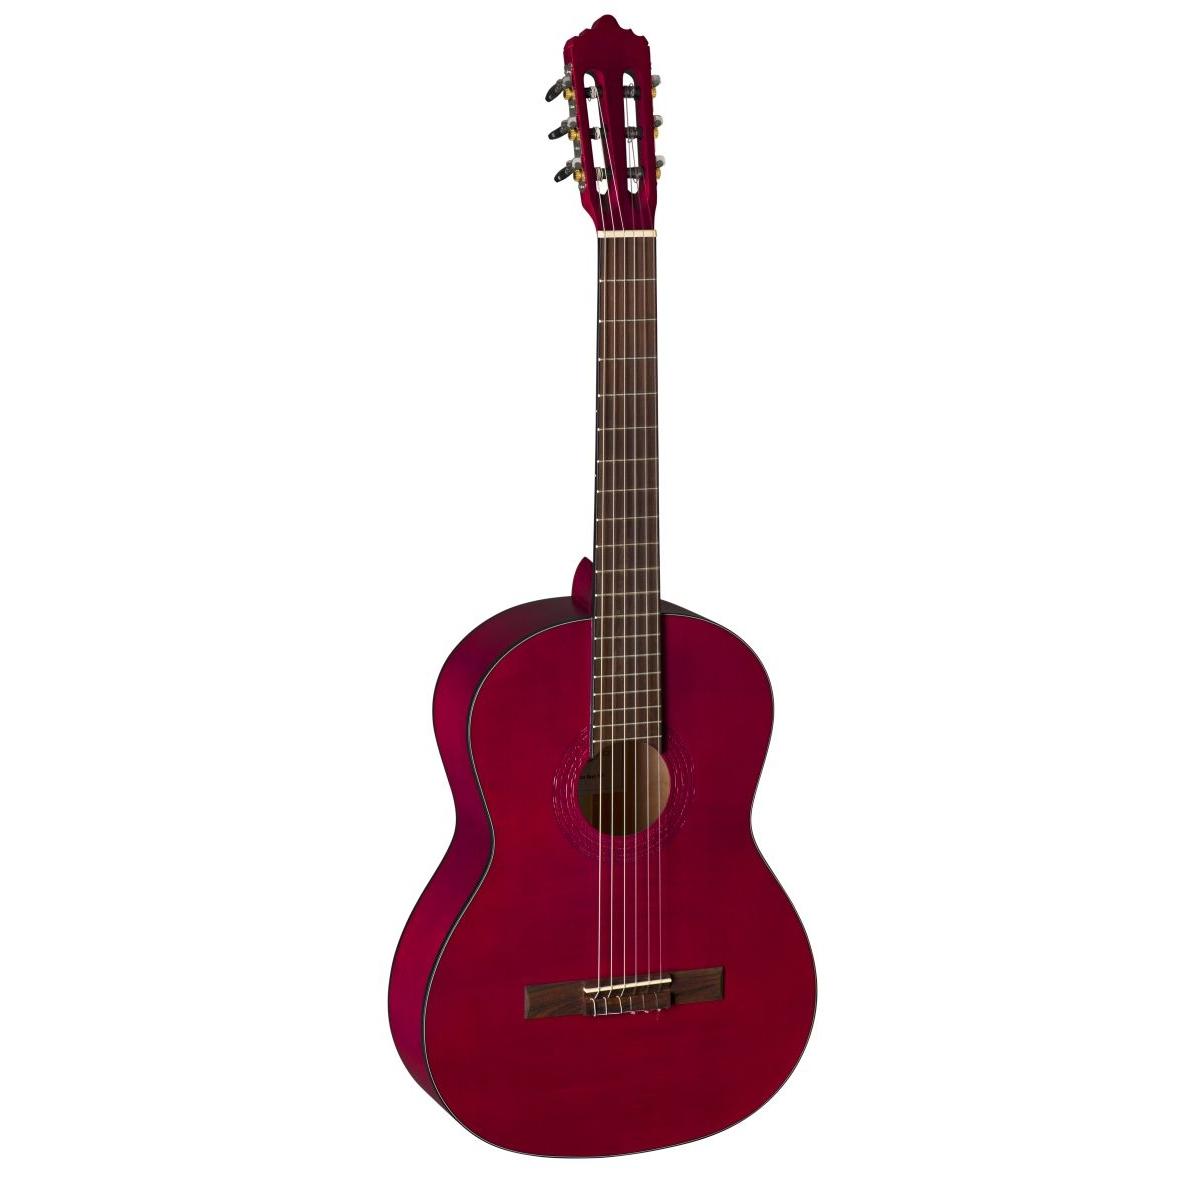 La Mancha Rubinito Rojo SM/63-N